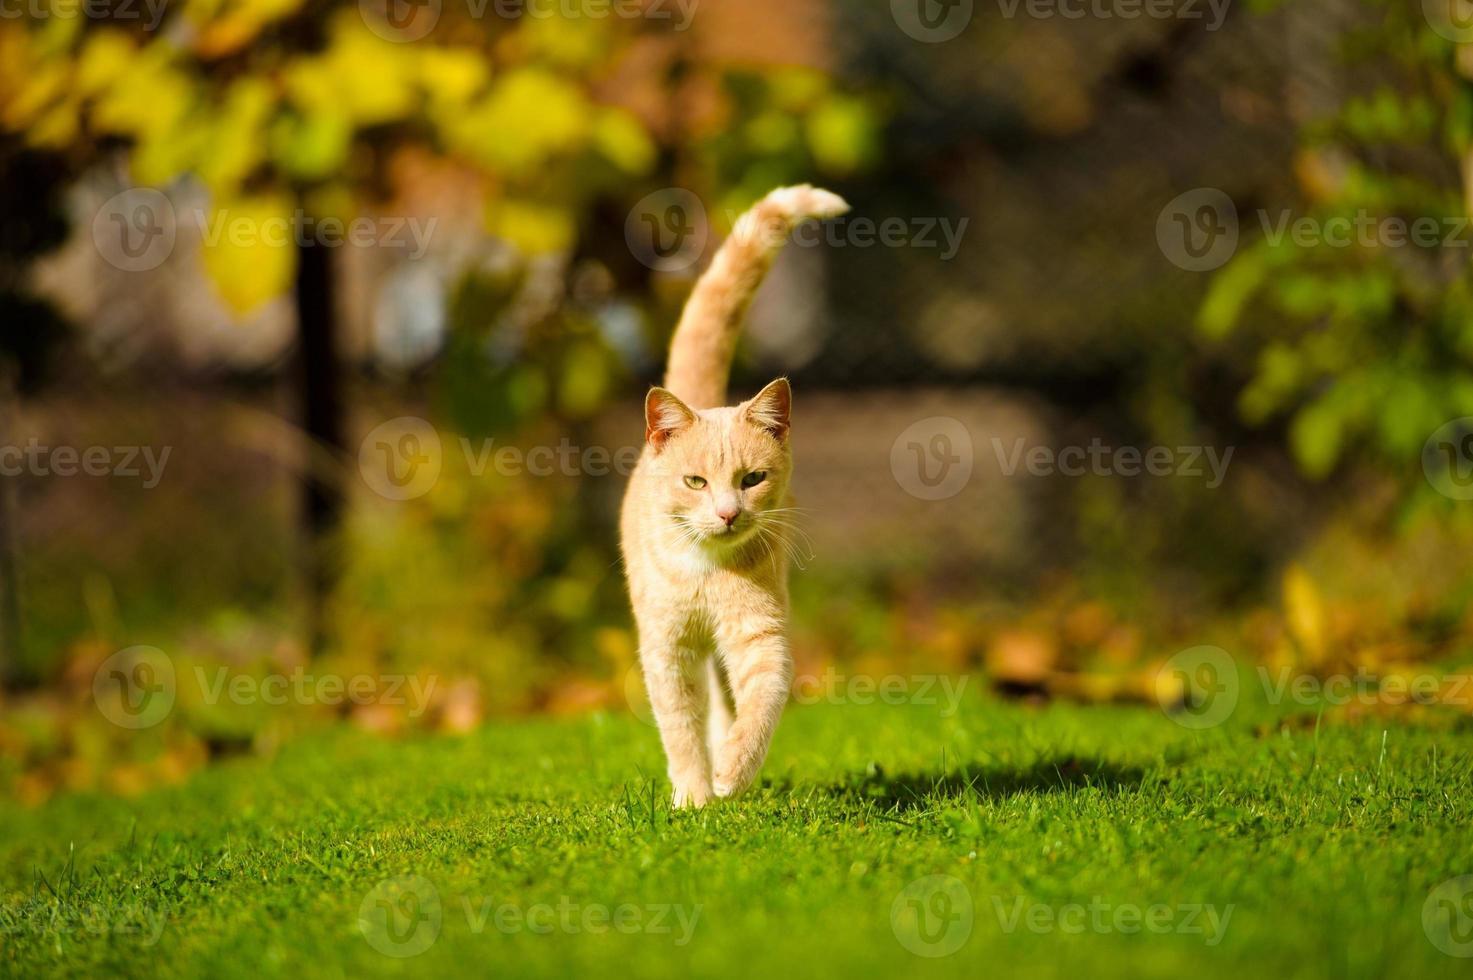 lustige Katze auf grünem Gras foto